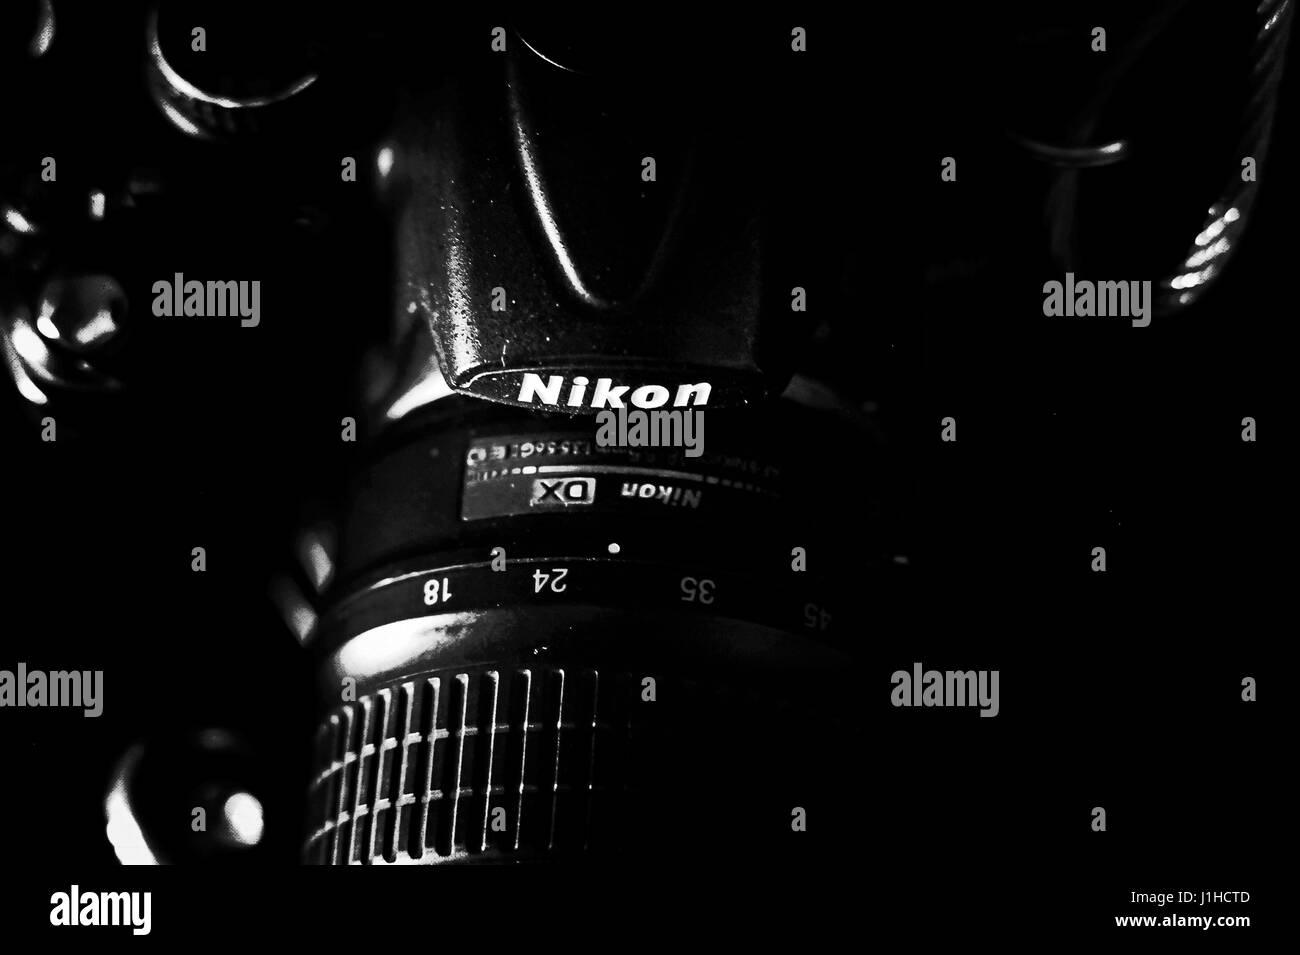 Nikon Camera - Stock-Bilder